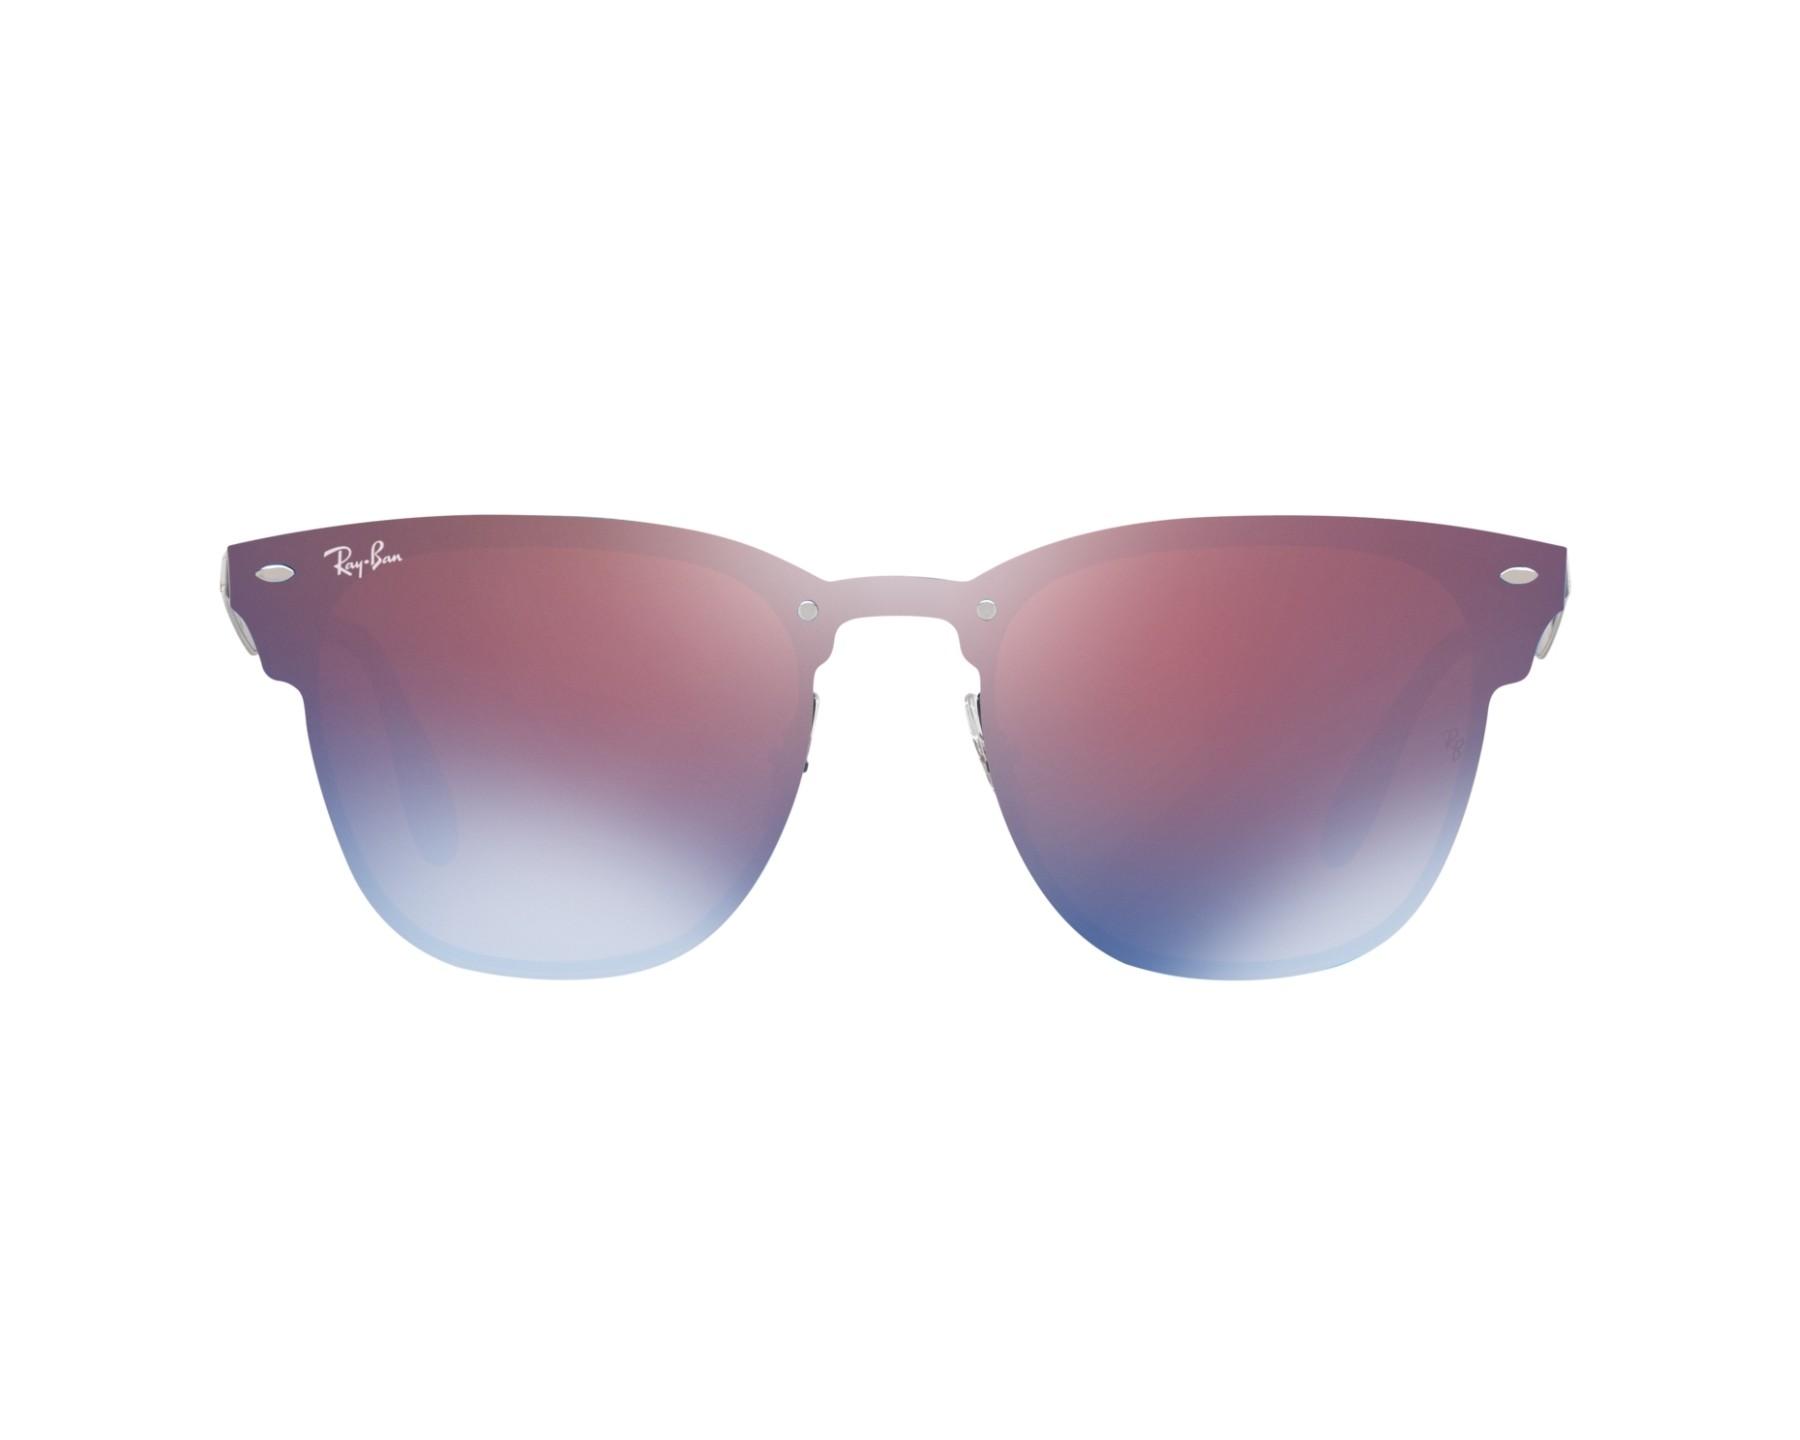 Sunglasses Ray-Ban RB-3576-N 153 7V 51-18 Black 64b720a253